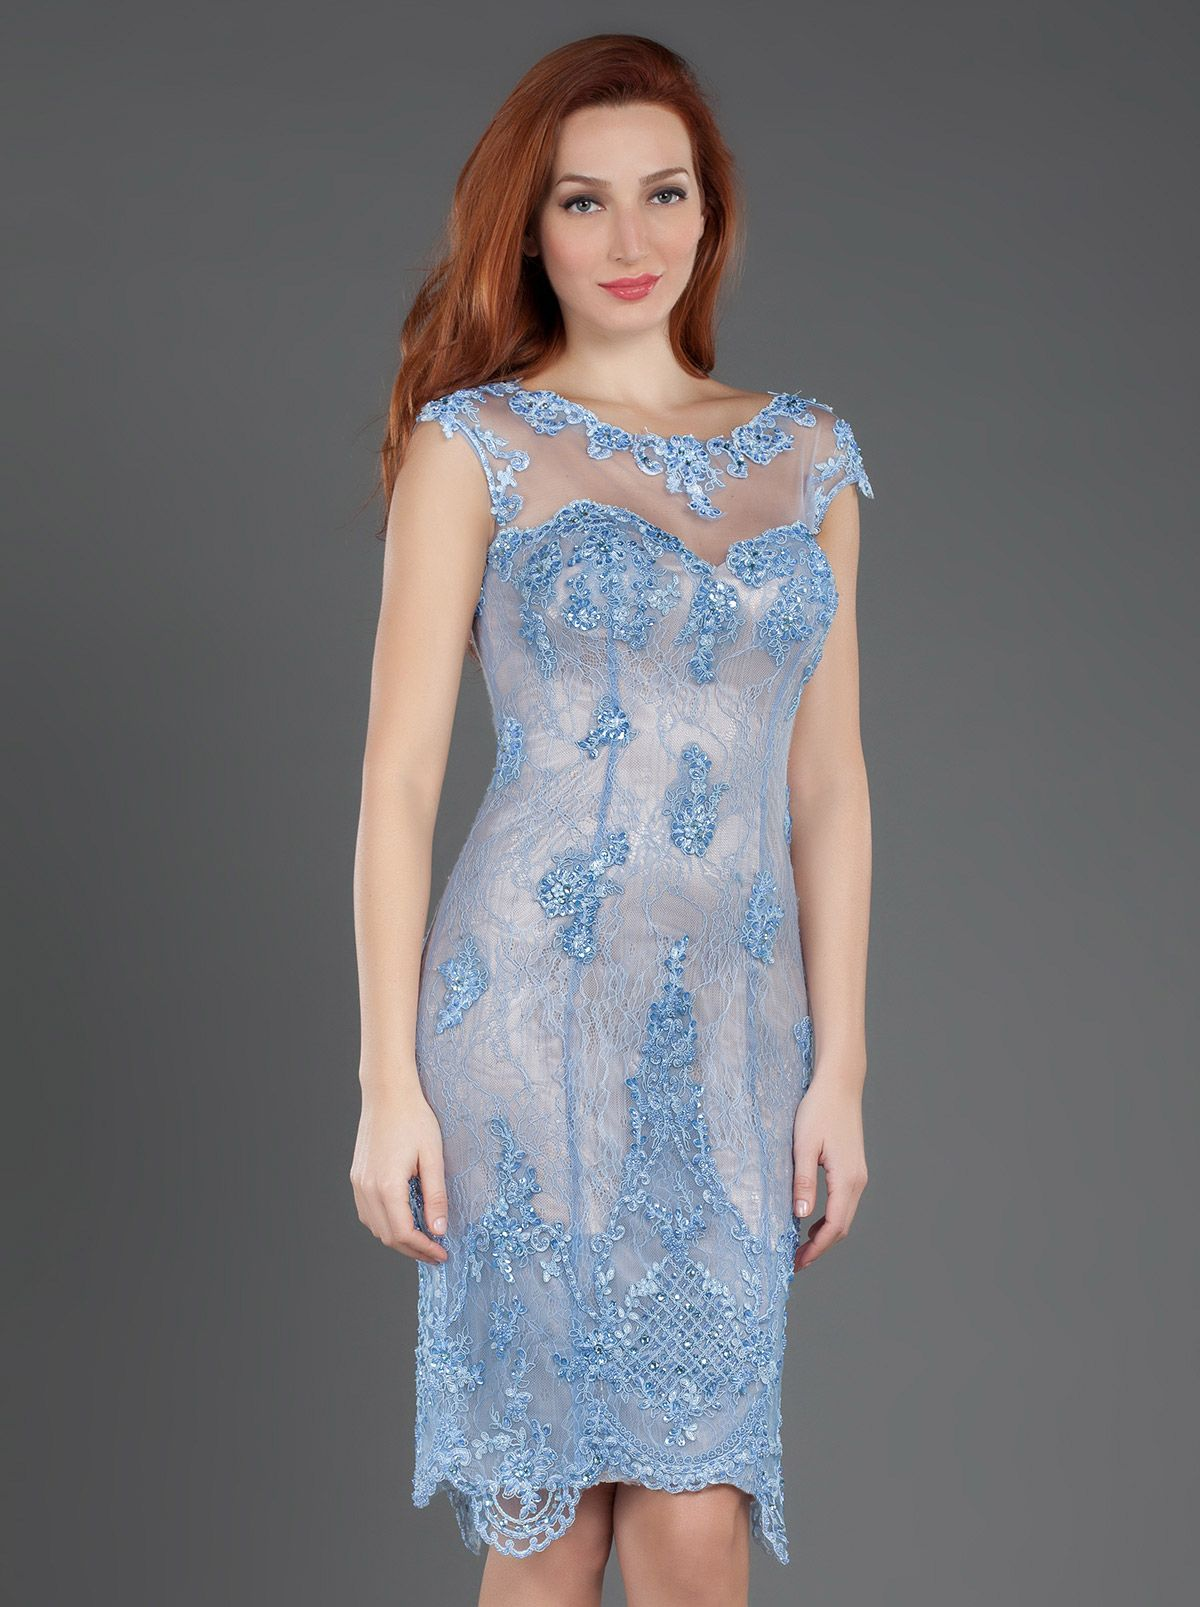 eb6a30450e2f Pin από το χρήστη Mikael Evening Dresses στον πίνακα Cocktail Dresses 2015